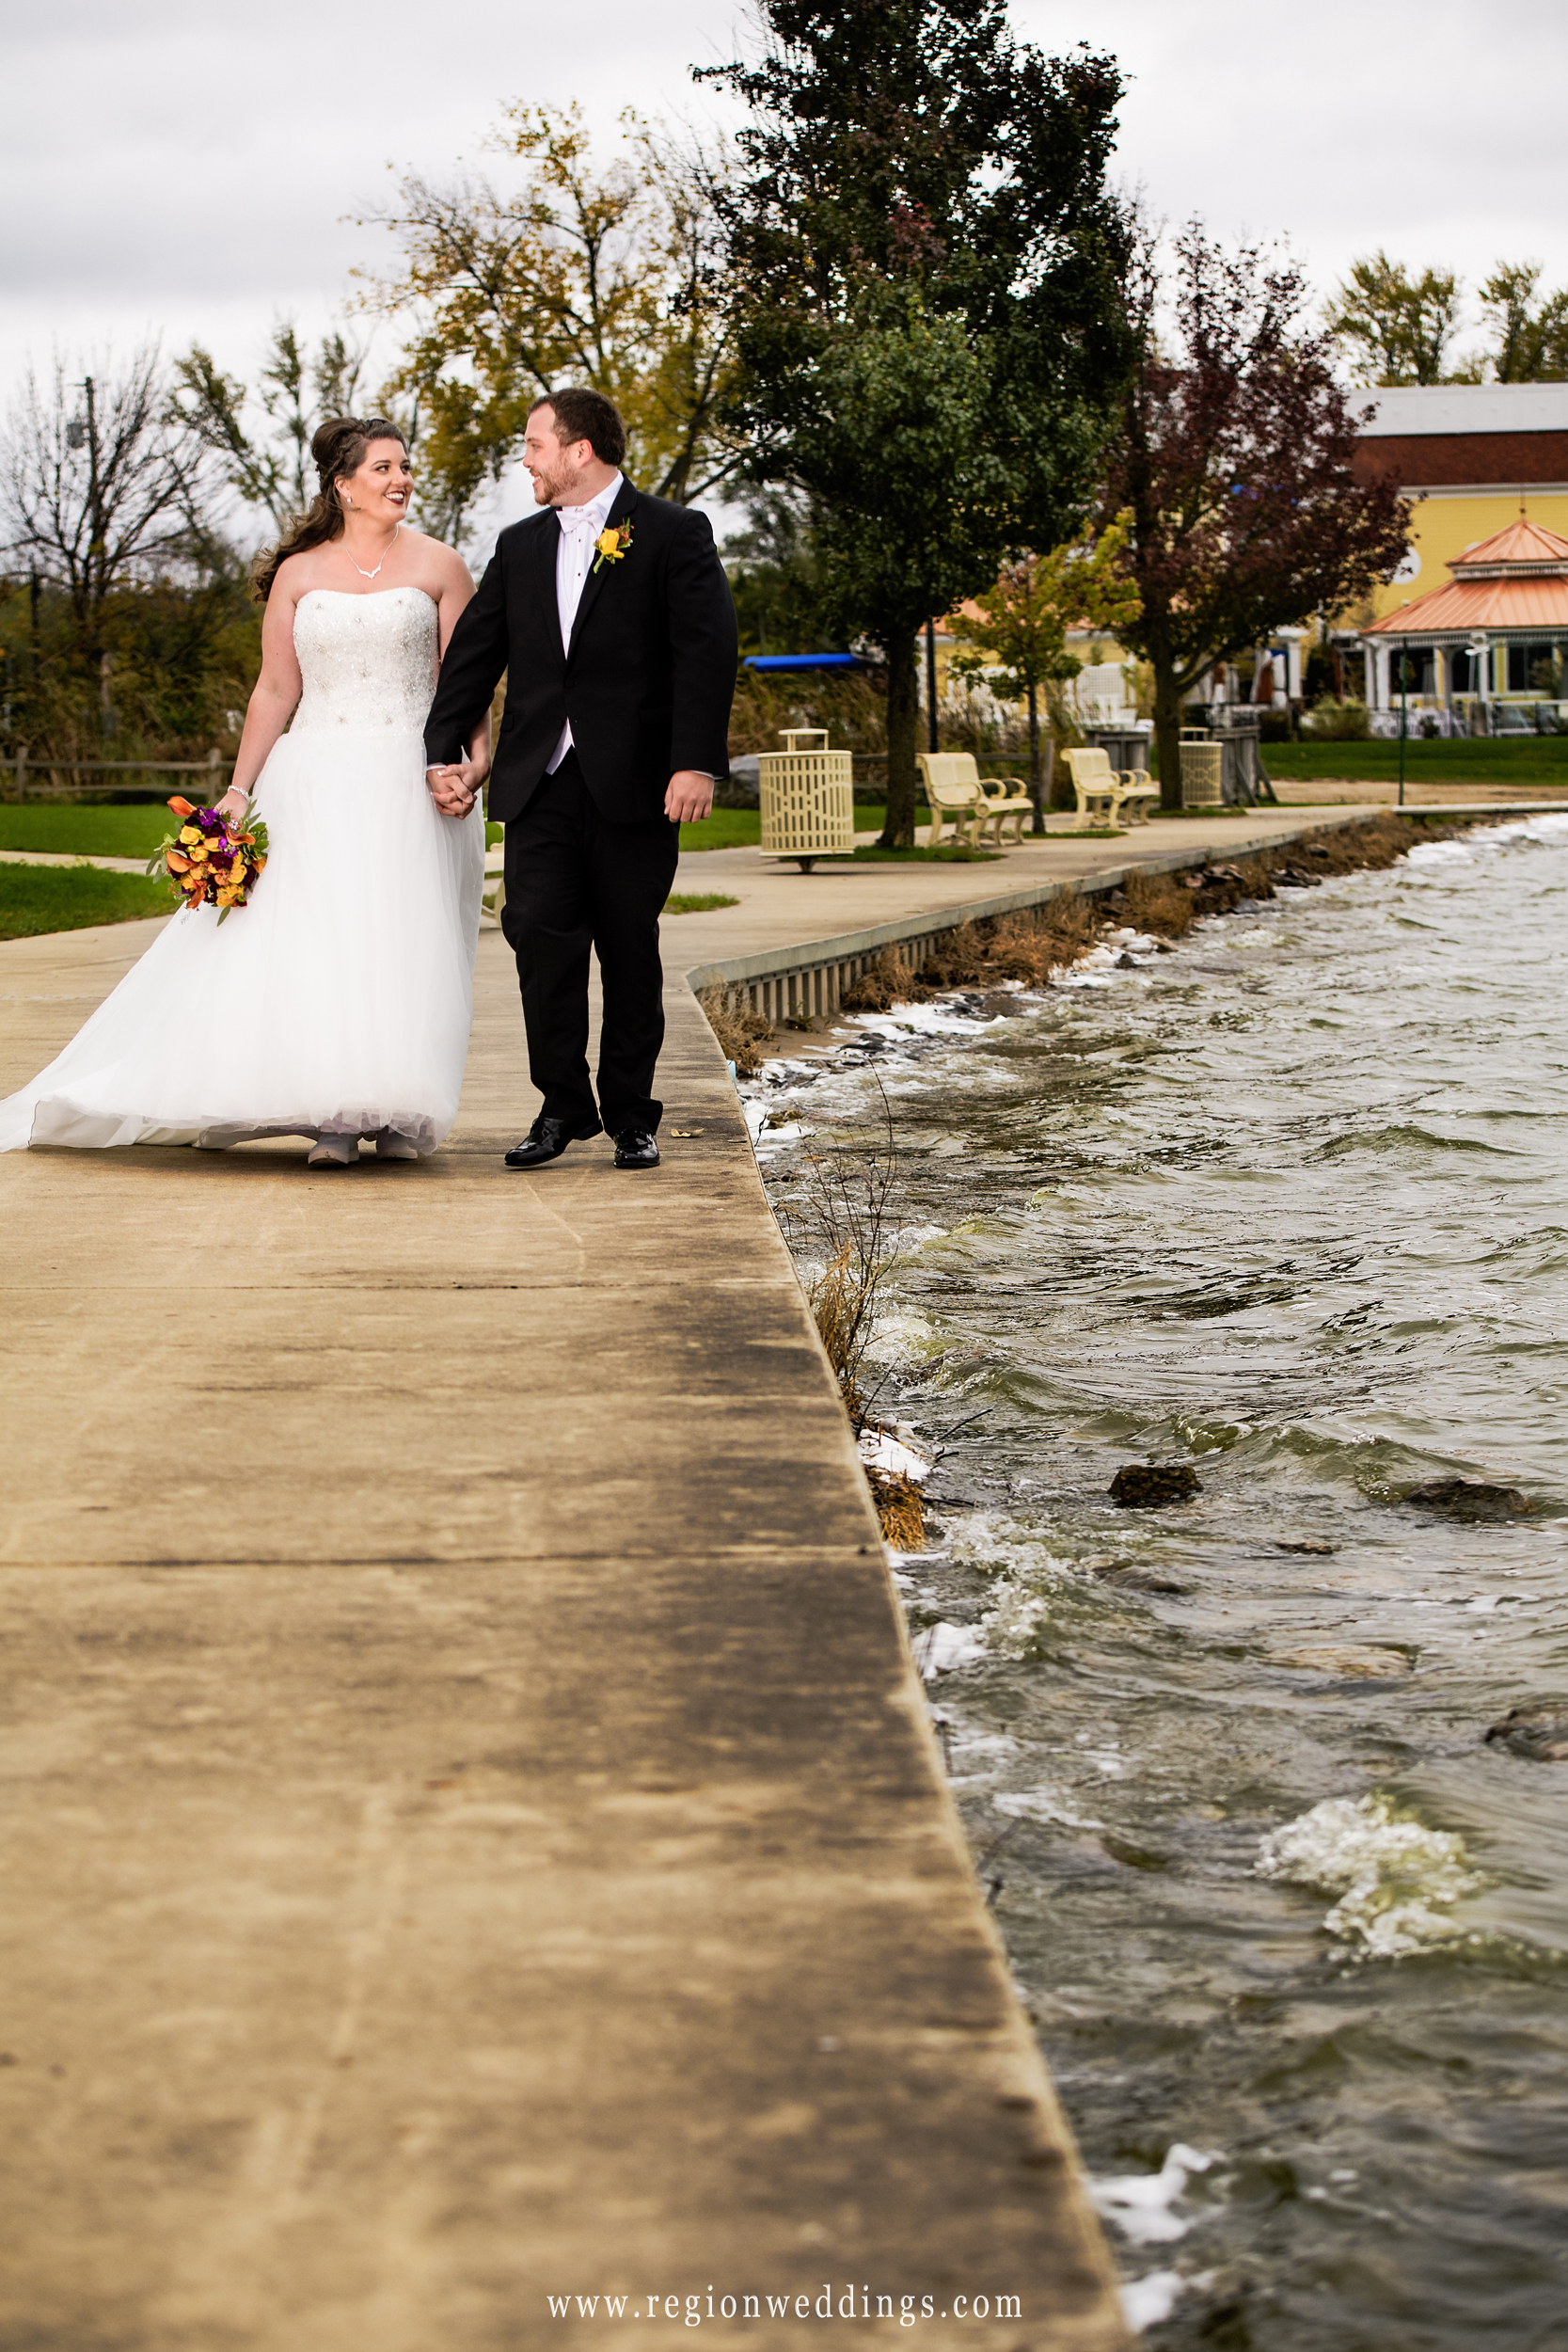 Bride and groom take a walk along the boardwalk of Cedar Lake.